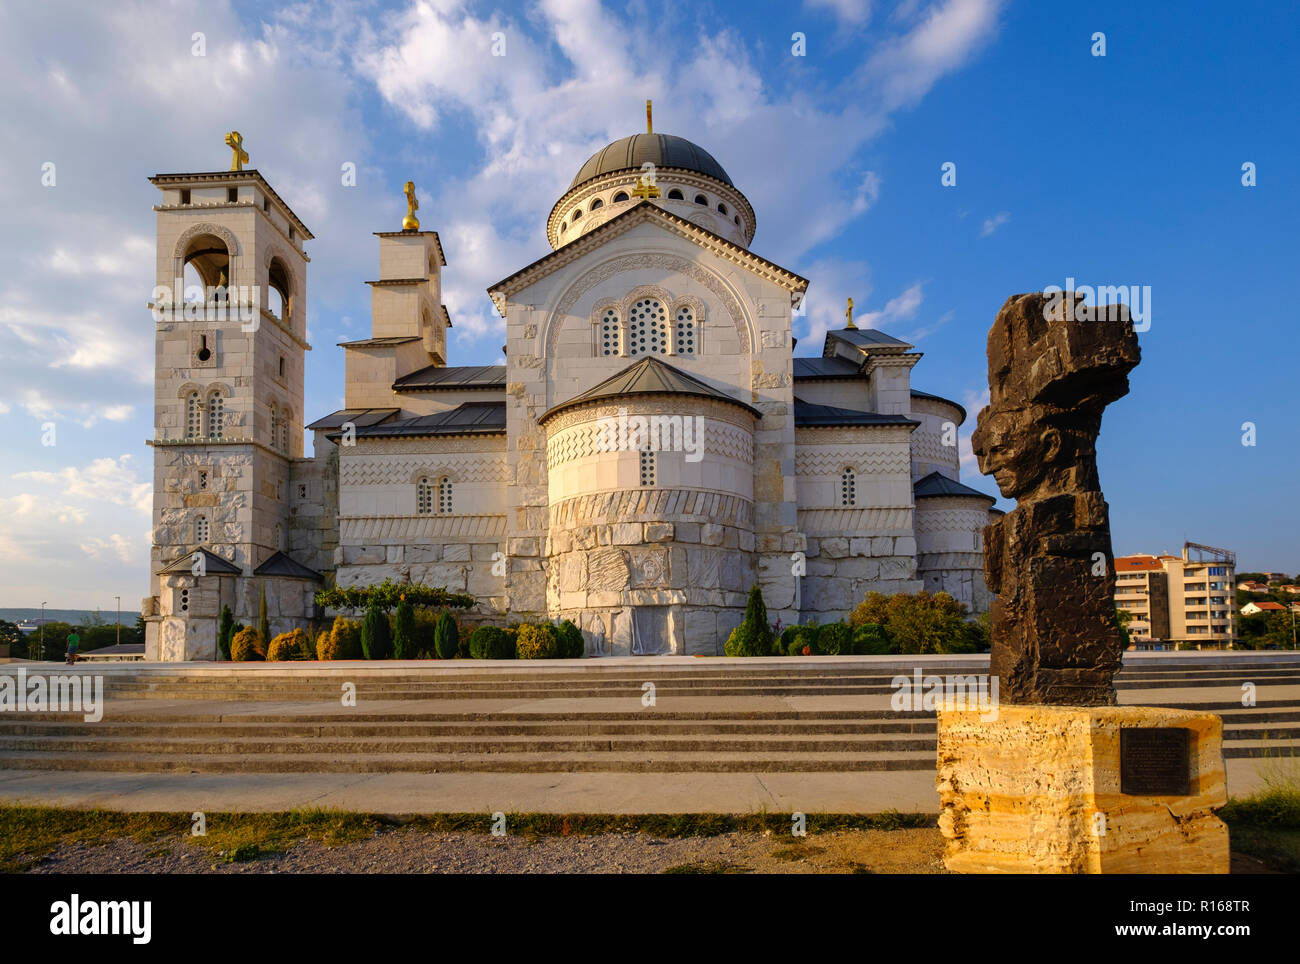 Serbian Orthodox Resurrection Cathedral, Saborni Hram Hristovog Vaskrsenja, Podgorica, Montenegro - Stock Image